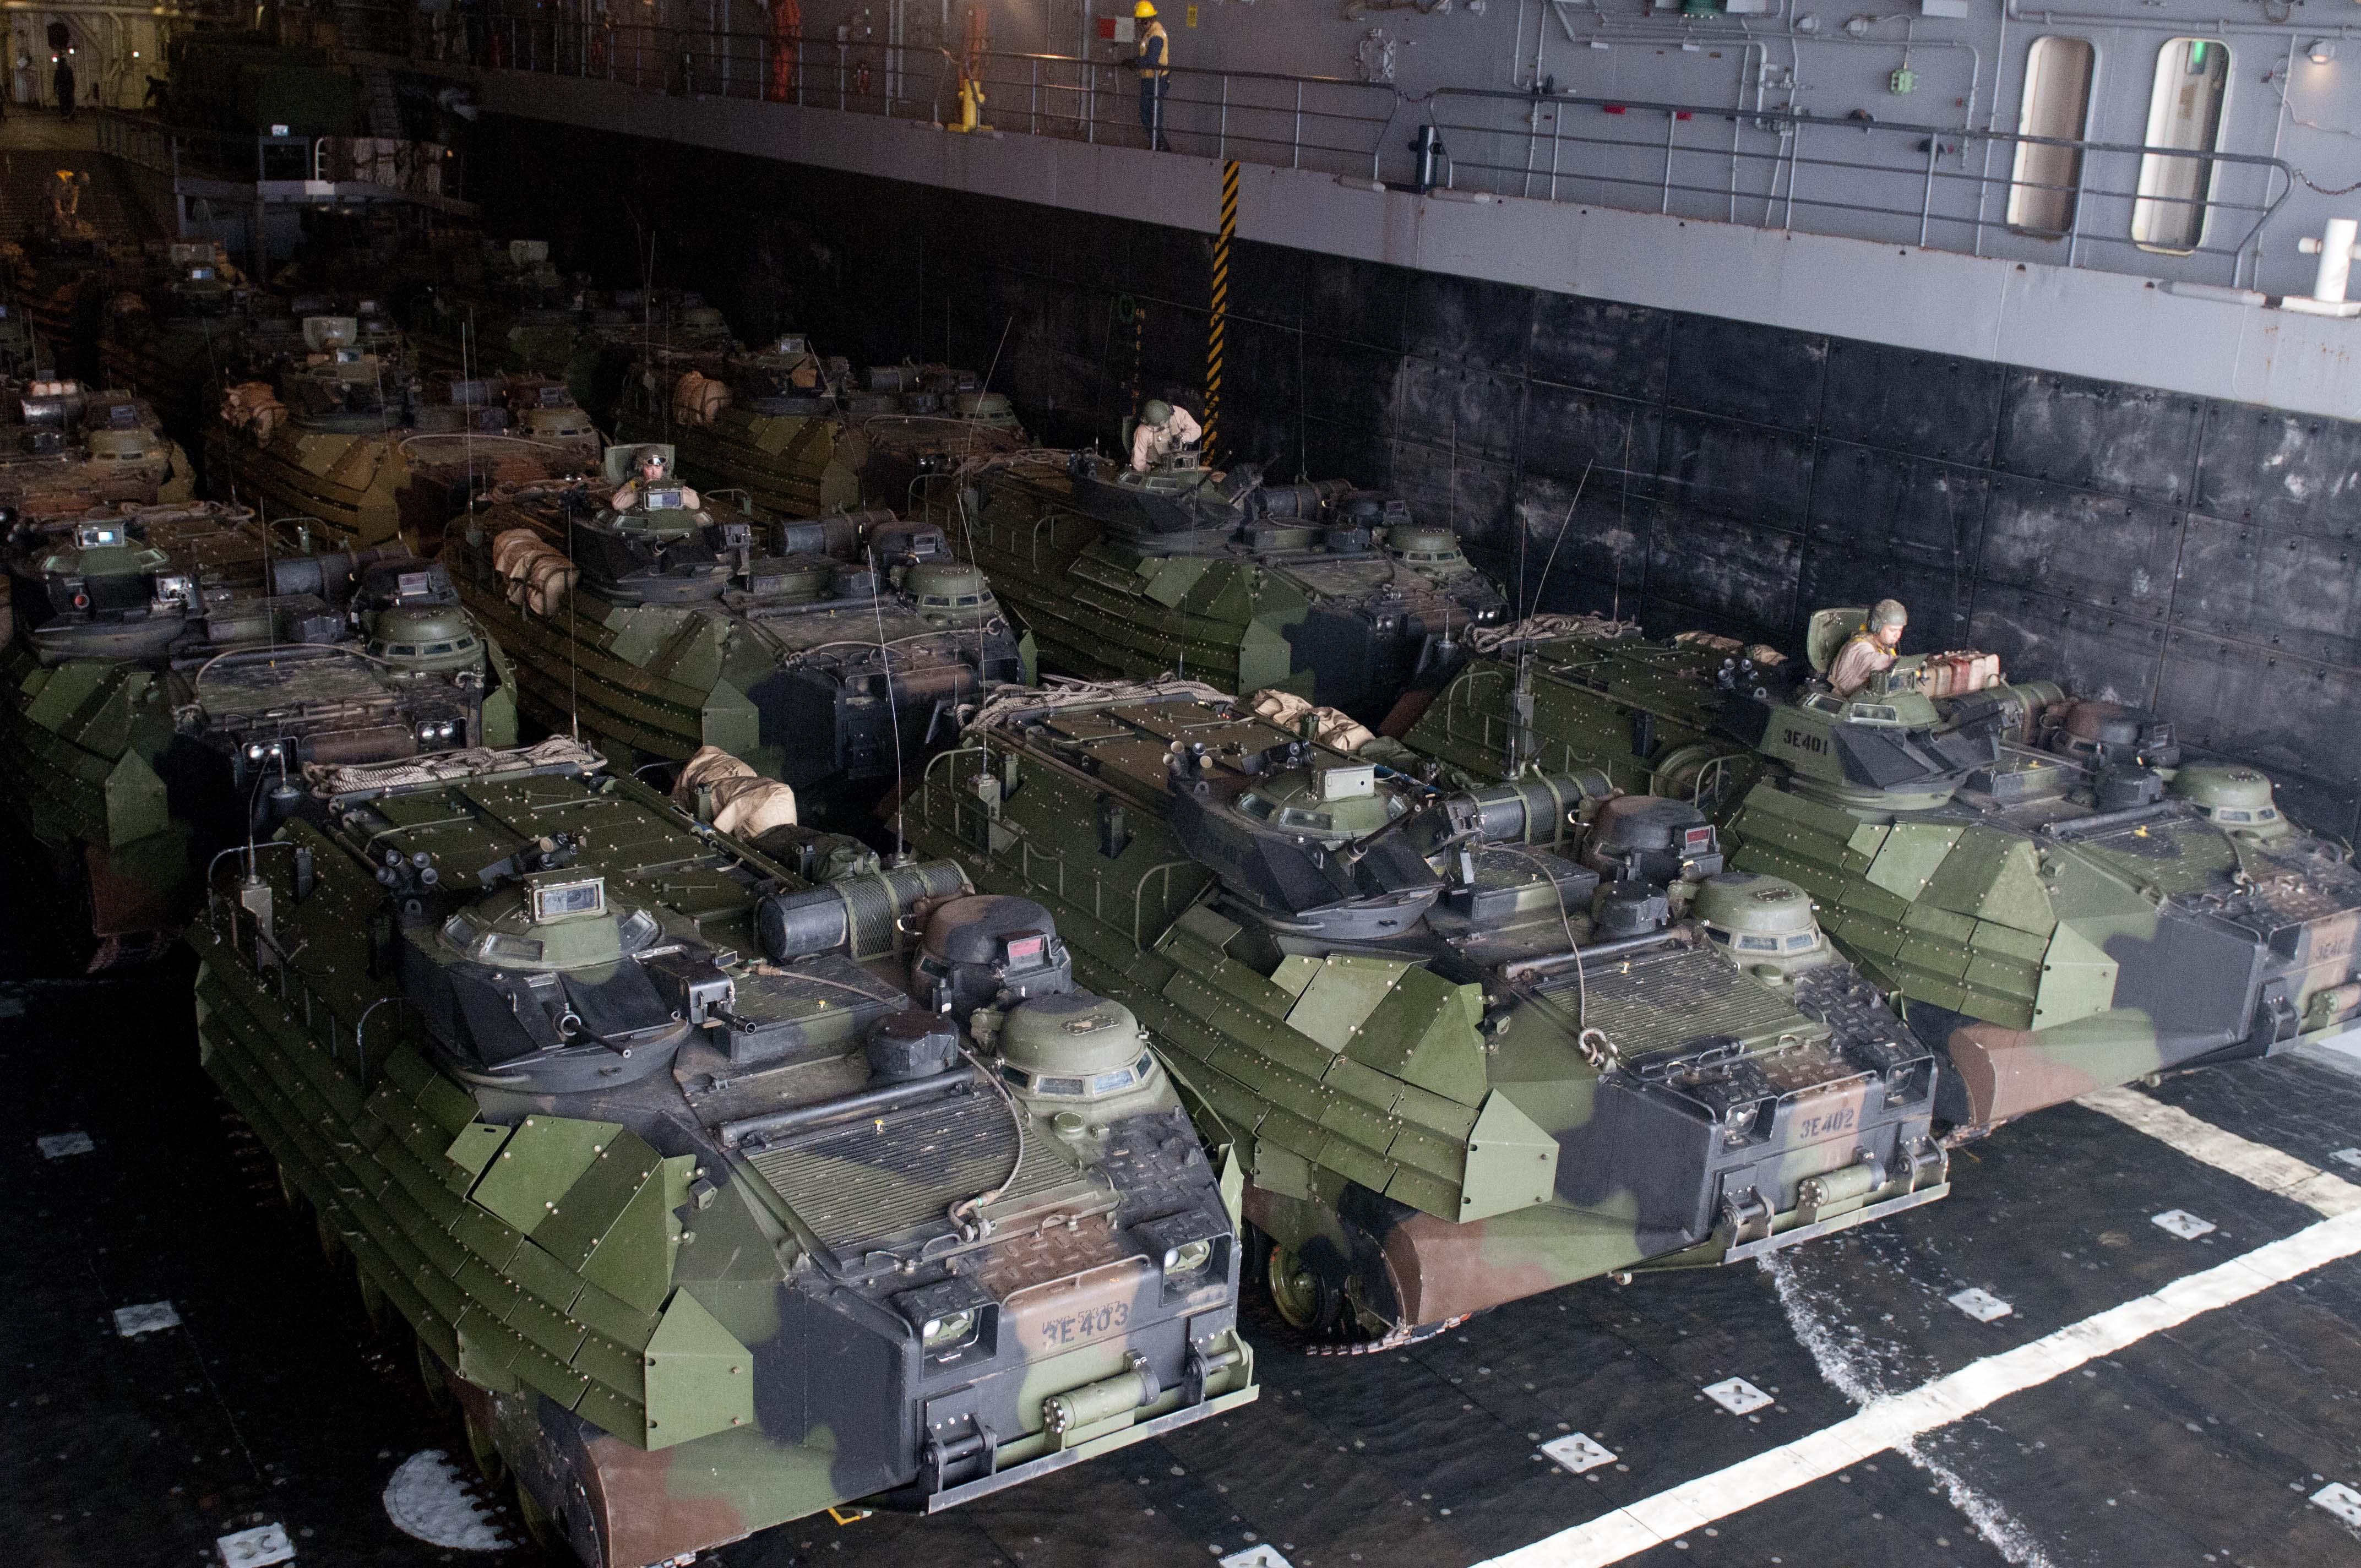 US_Navy_110815-N-PB383-001_Amphibious_assault_vehicles_prepare_to_depart_the_well_deck_of_the_San_Antonio-class_amphibious_transport_dock_ship_USS.jpg